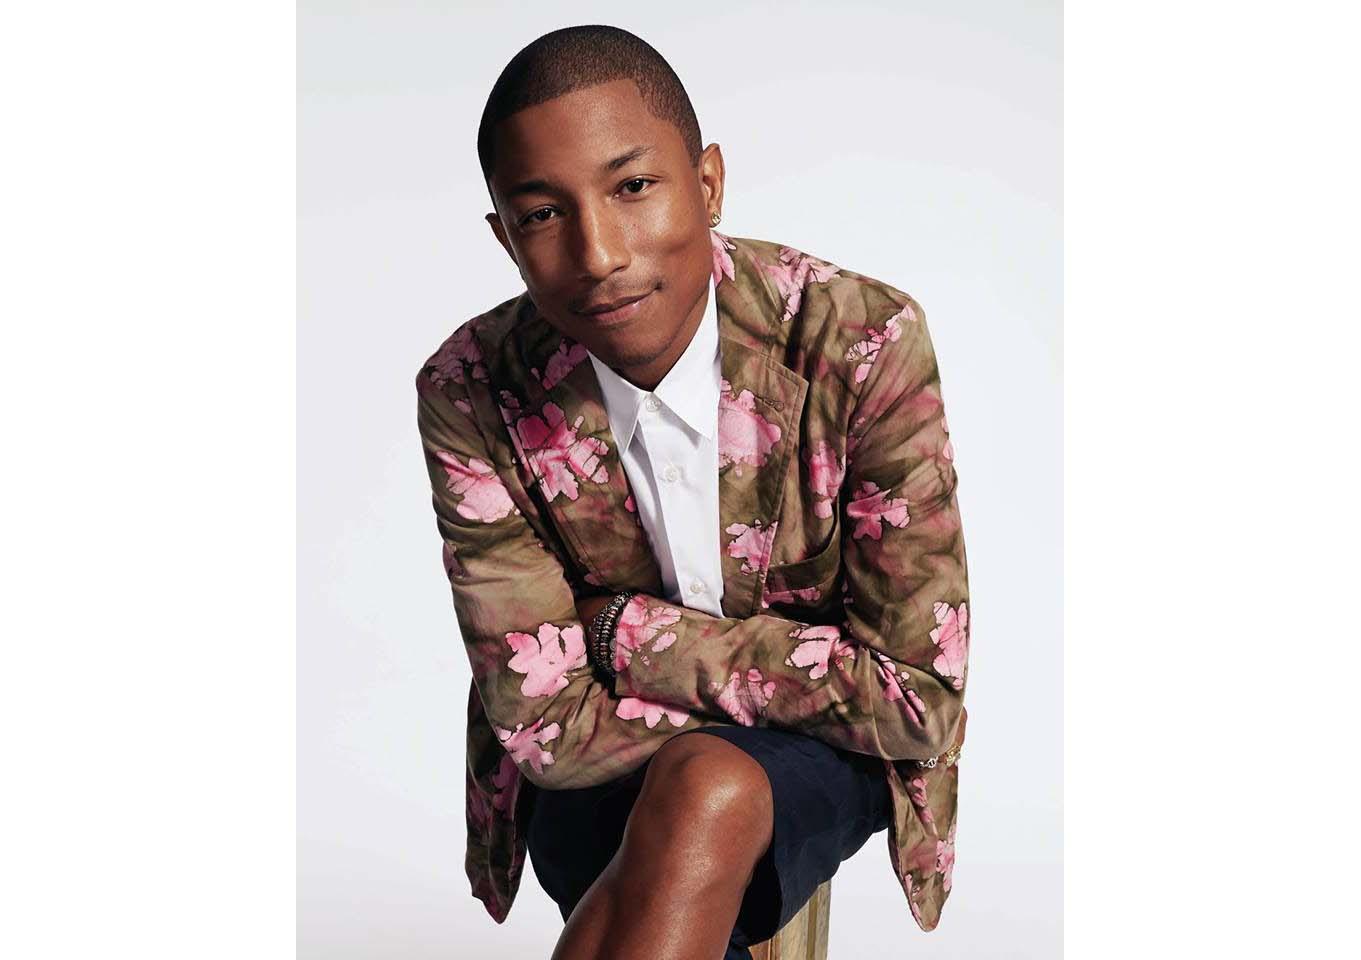 Pharrell Williams. Image courtesy: Facebook